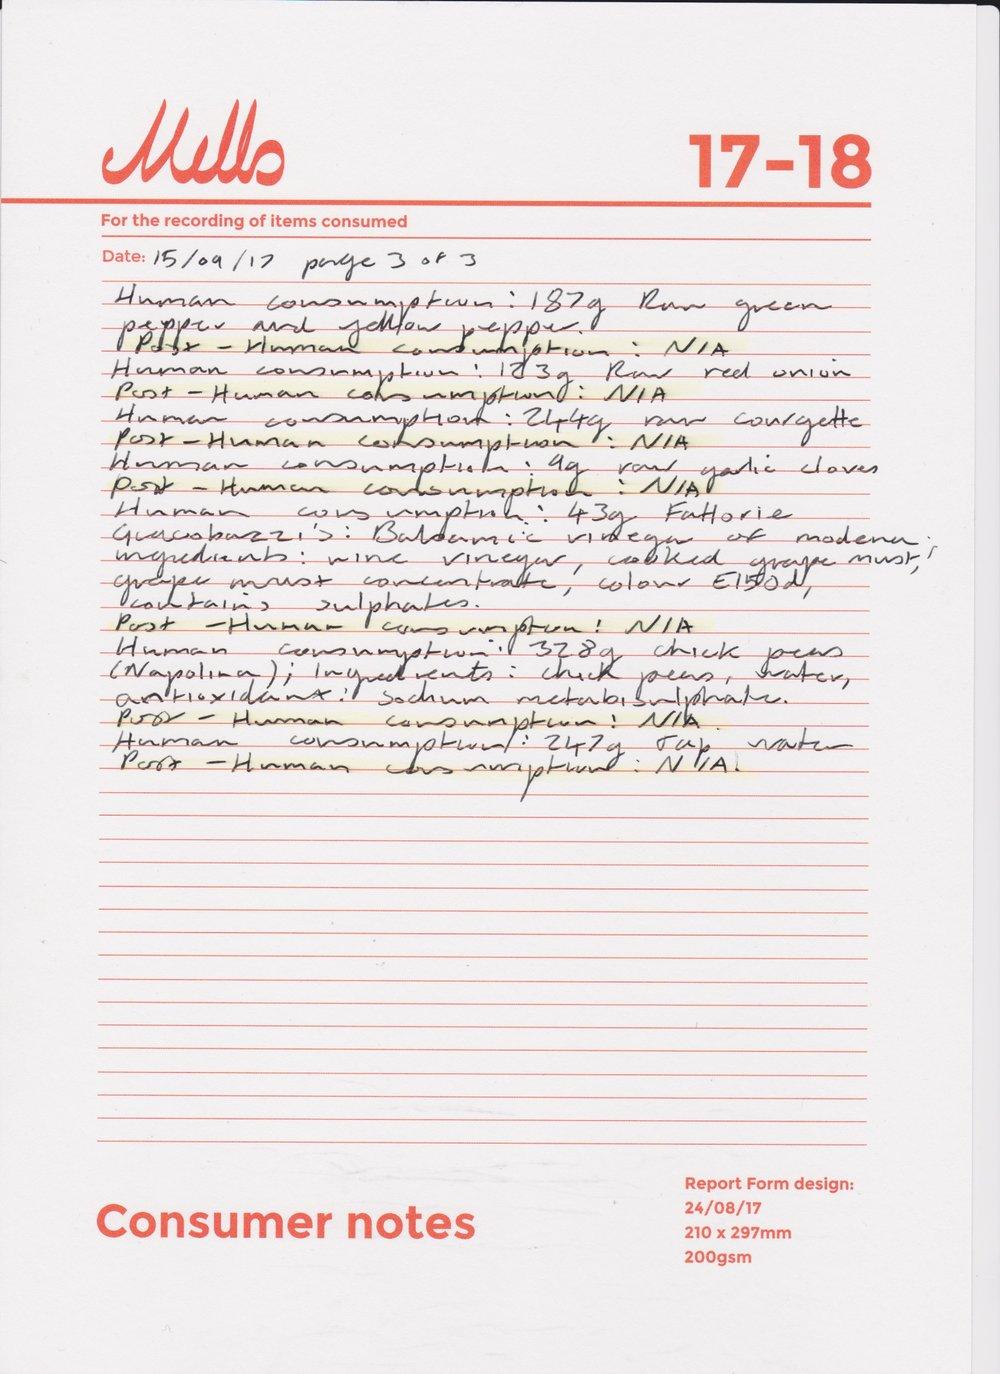 Steven Mills Consumer notes 150917 pg3 of 3.jpeg